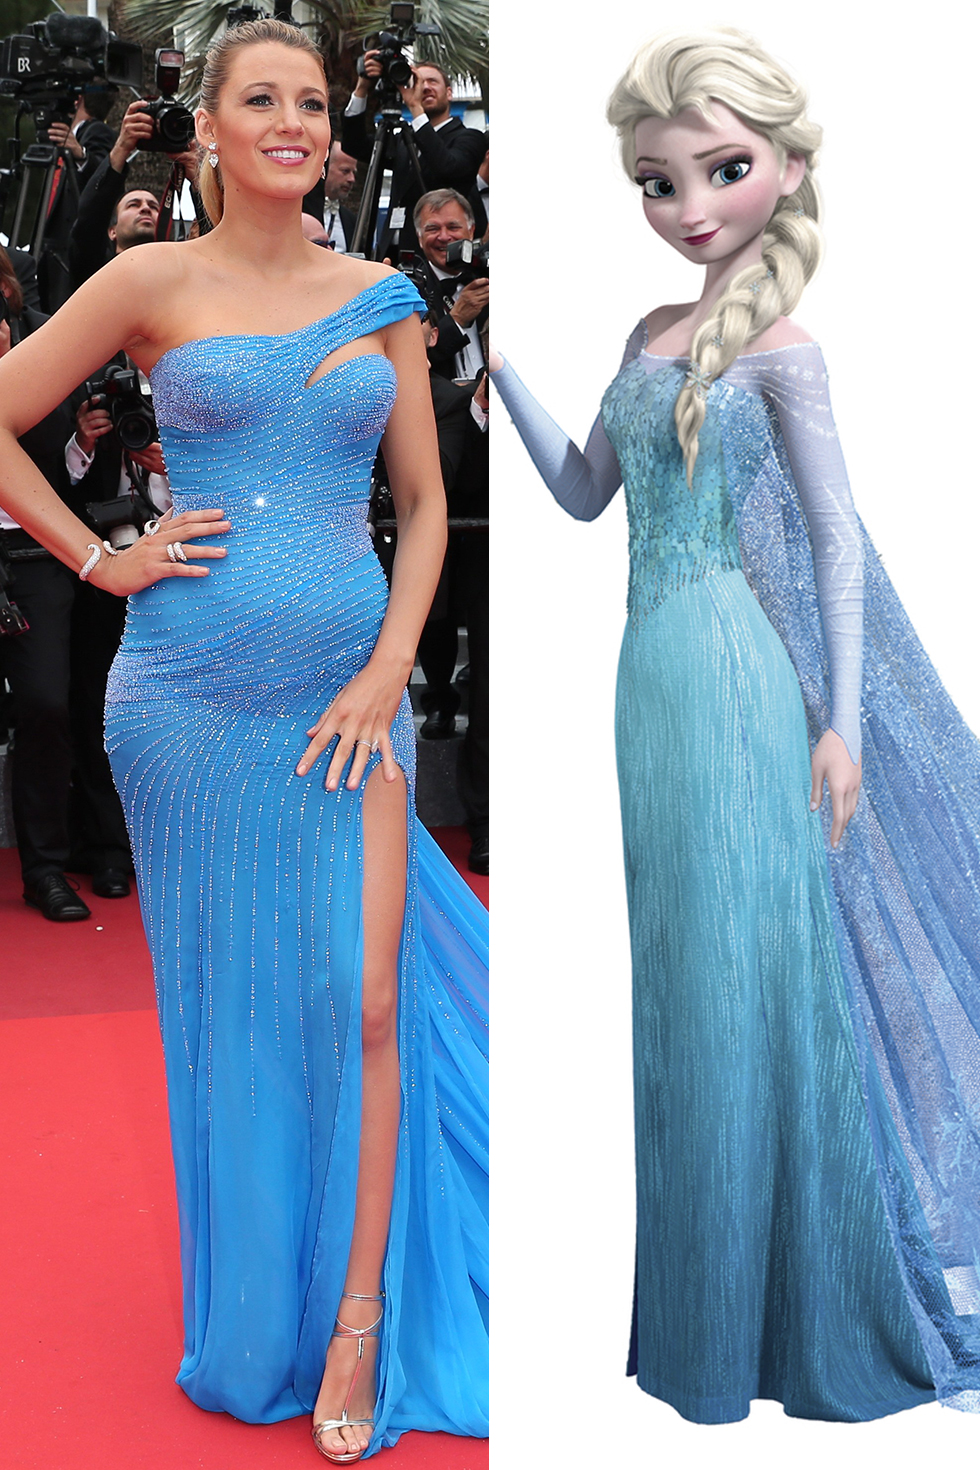 Celebrities Dressed Like Disney Princesses On The Red Carpet